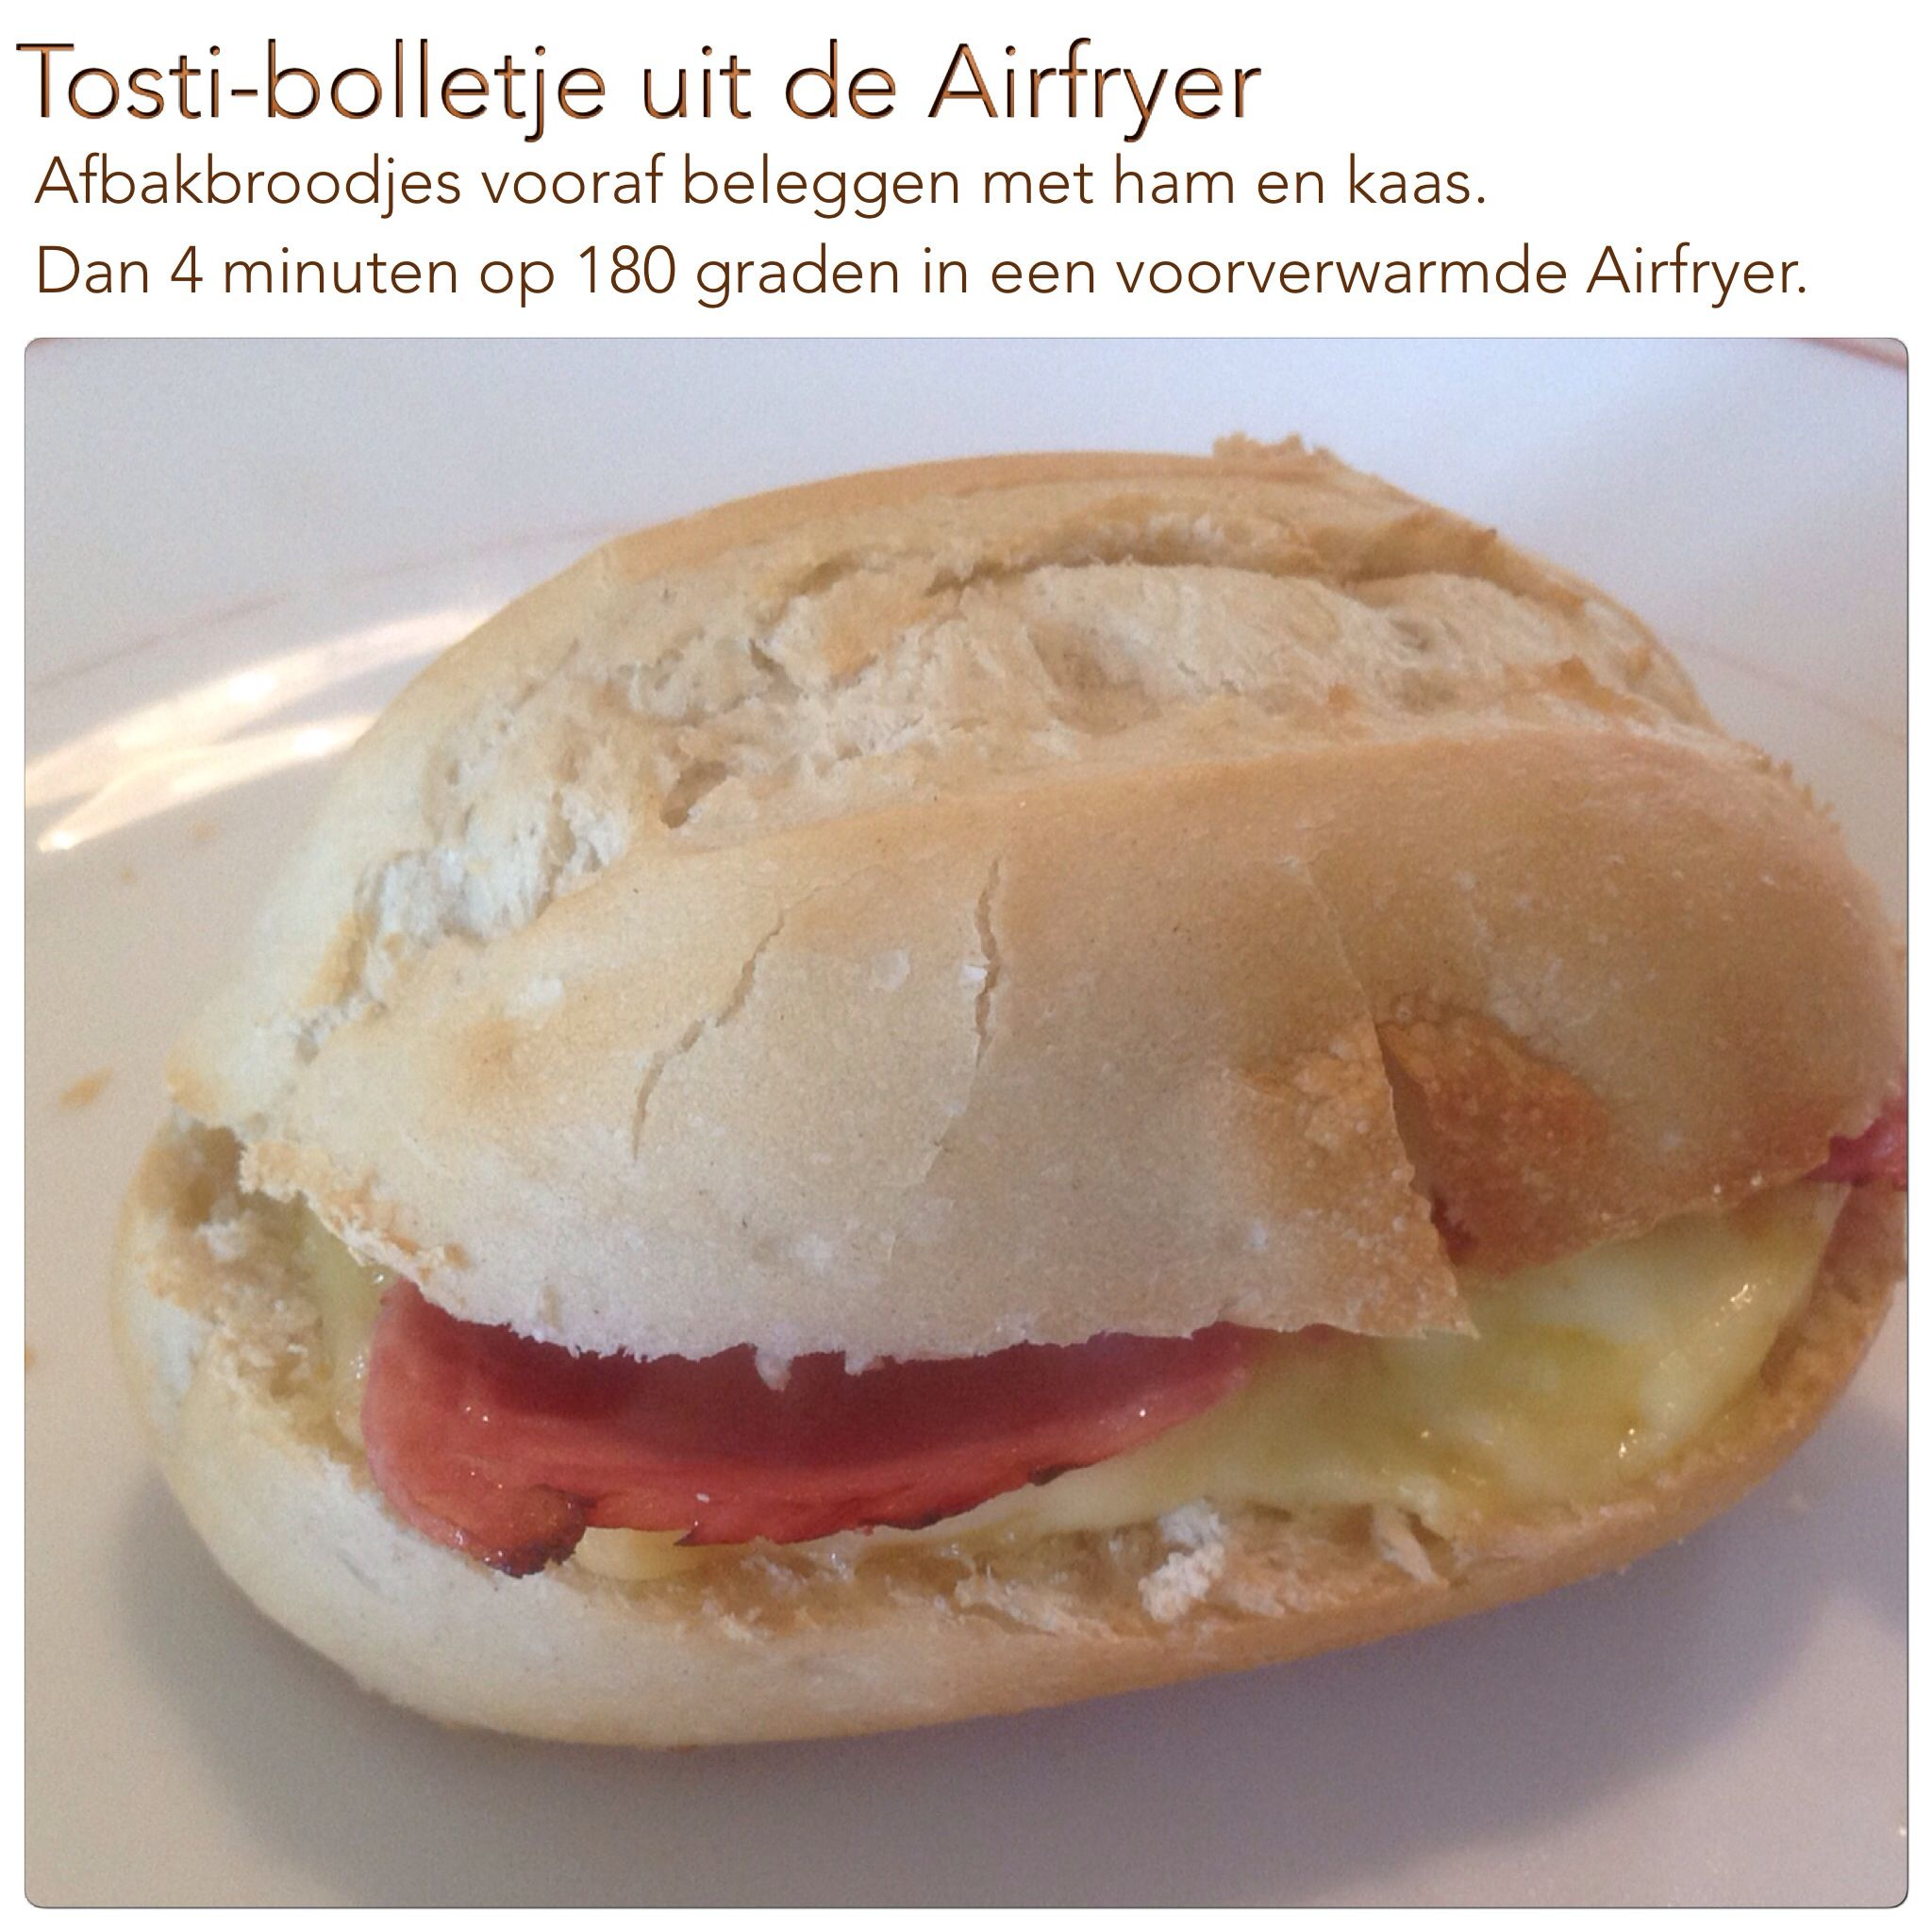 Tosti Bolletje Uit De Airfryer 4 Minuten Op 180 Graden